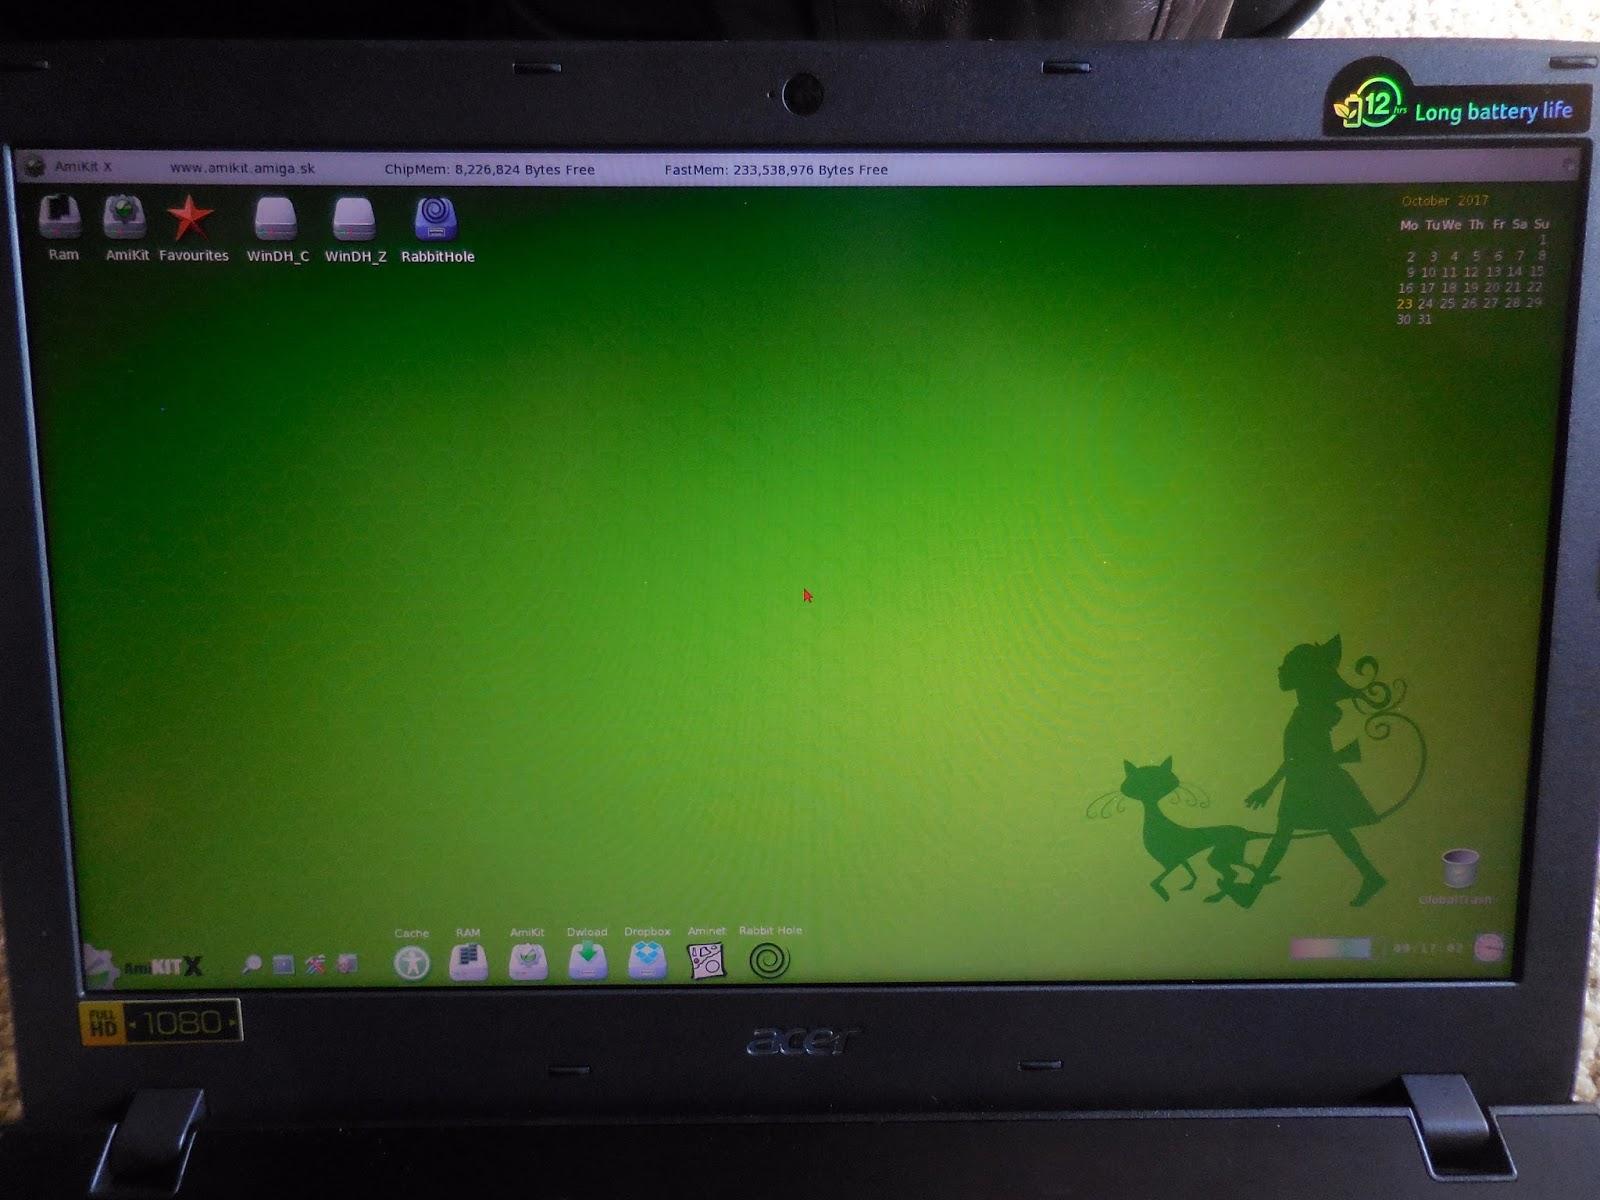 retro-link: Unboxing A L I C E  (A Laptop Incorporating a Classic